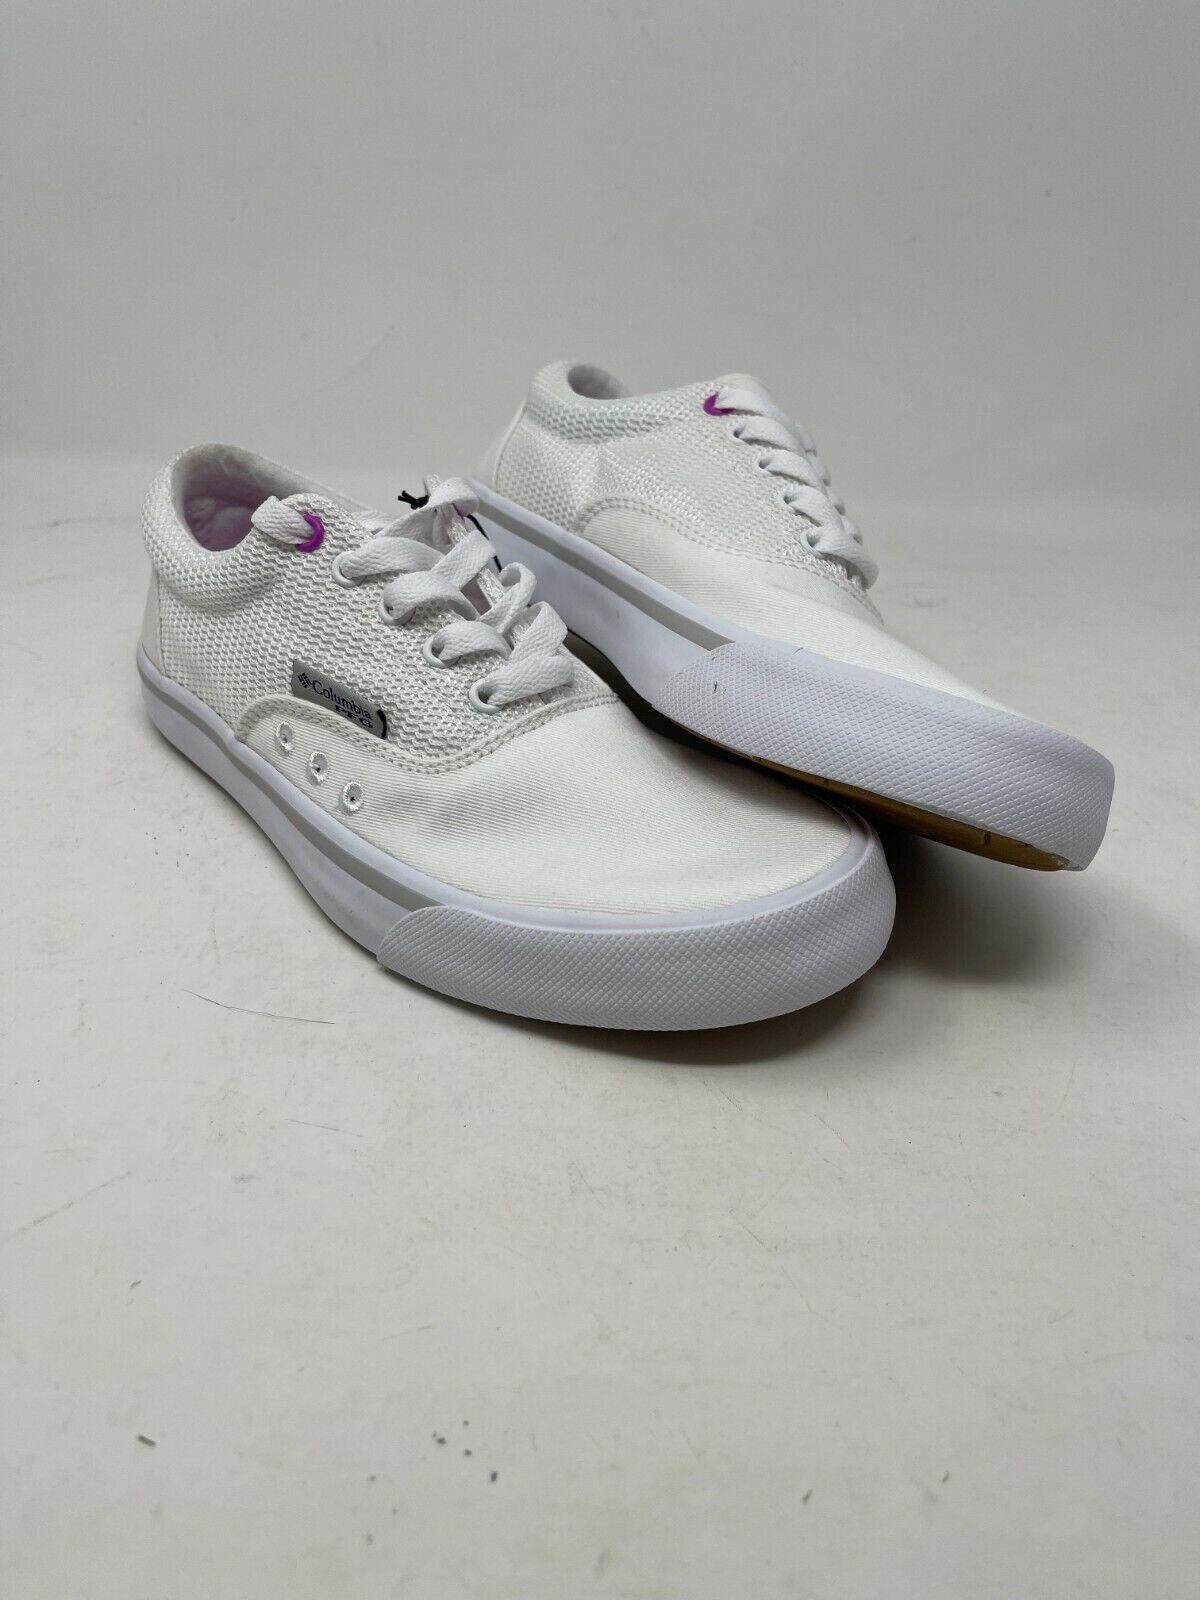 NEW Women's White Columbia Slack Water PFG Lace #BL0152-100 Shoes Size 7 #U2